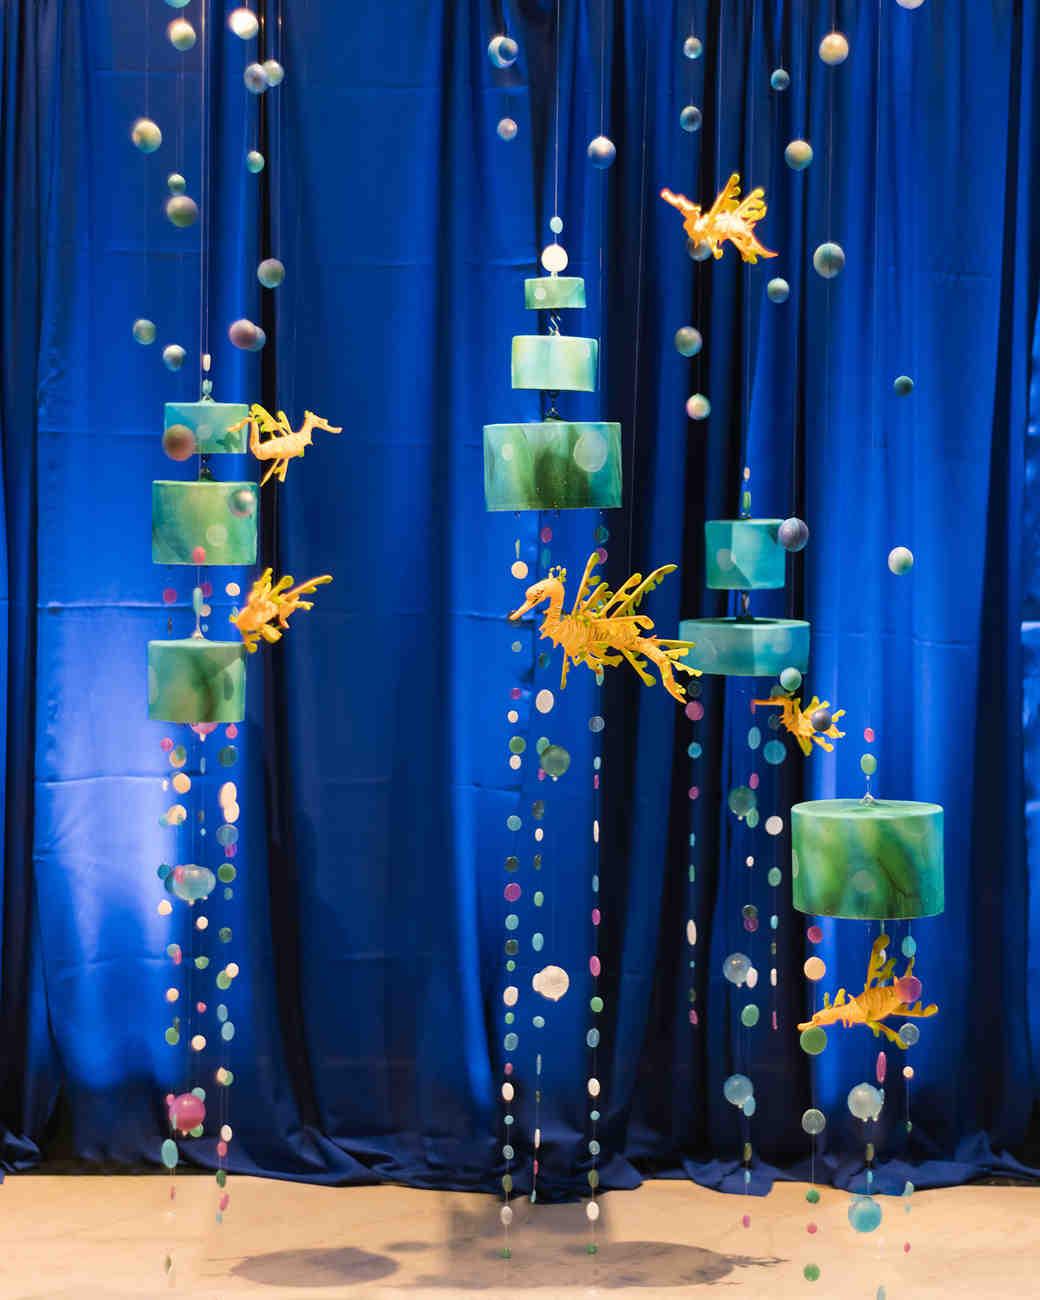 duff goldman ocean wedding cake installation